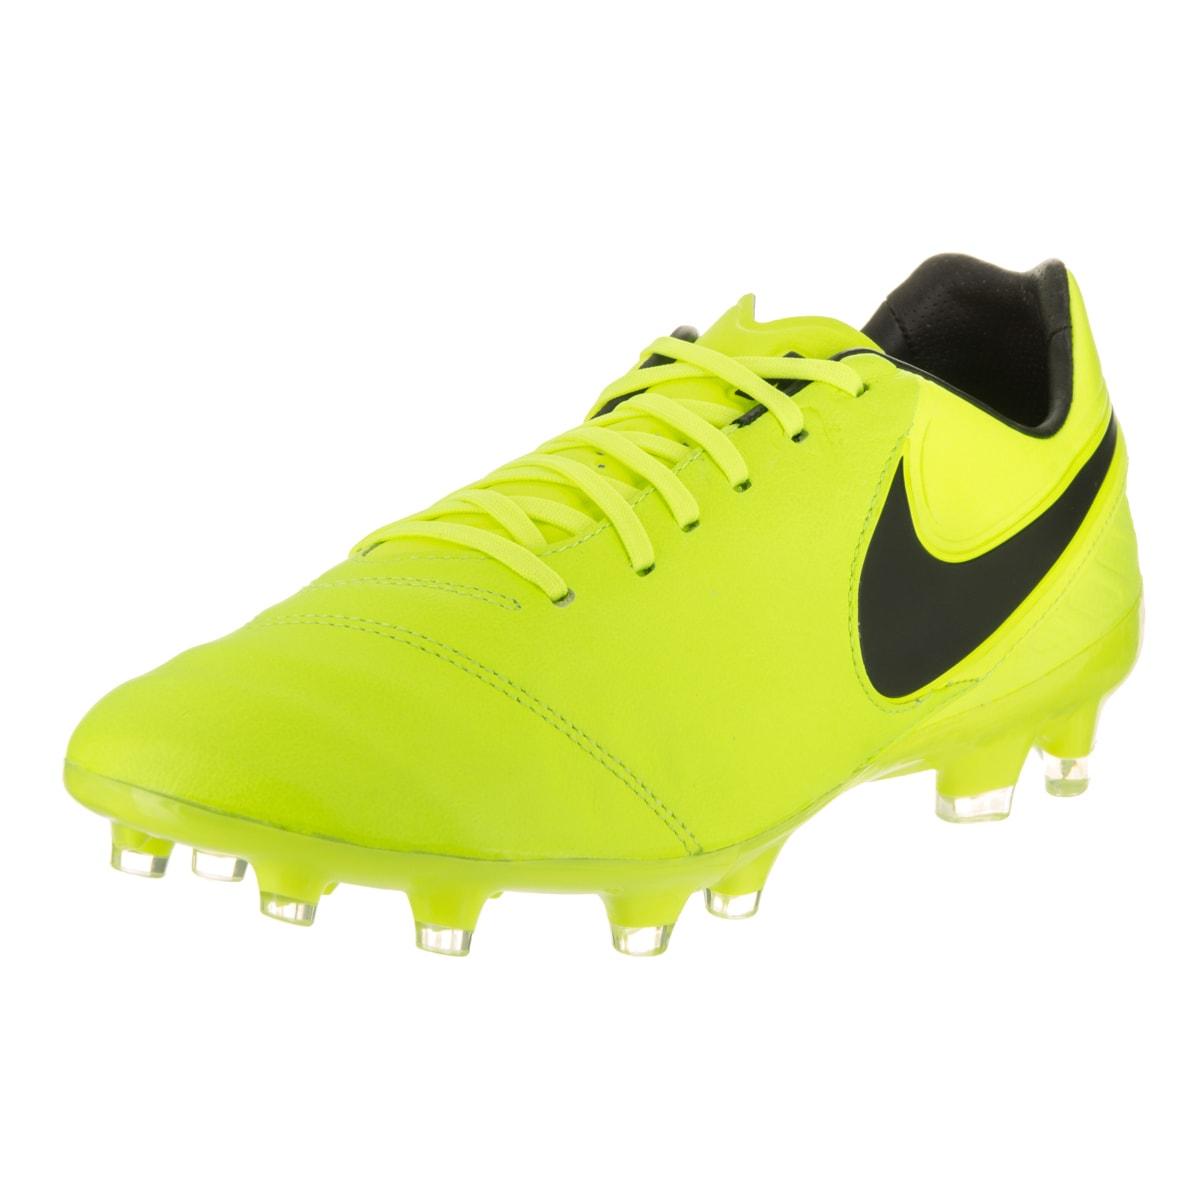 Nike Men's Tiempo Legacy II Fg Yellow Soccer Cleats (9) (...